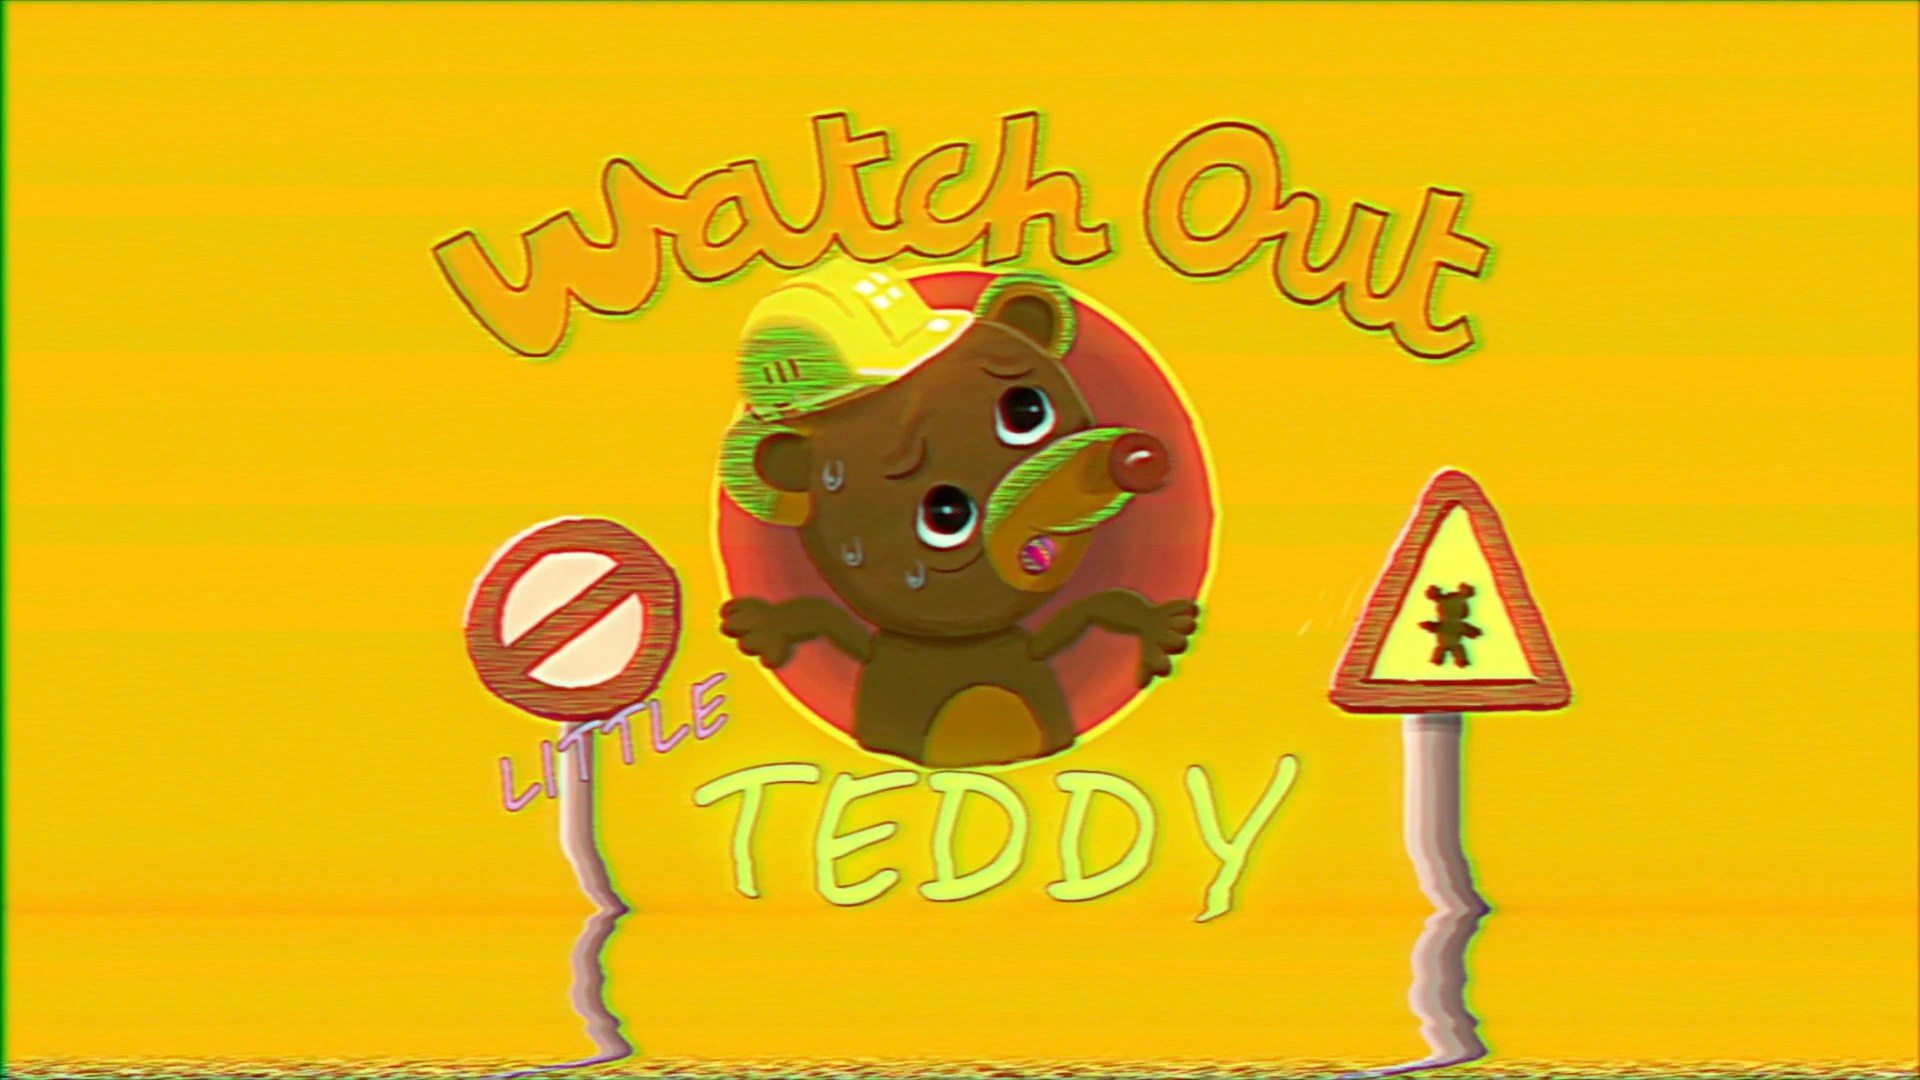 watch out little teddy